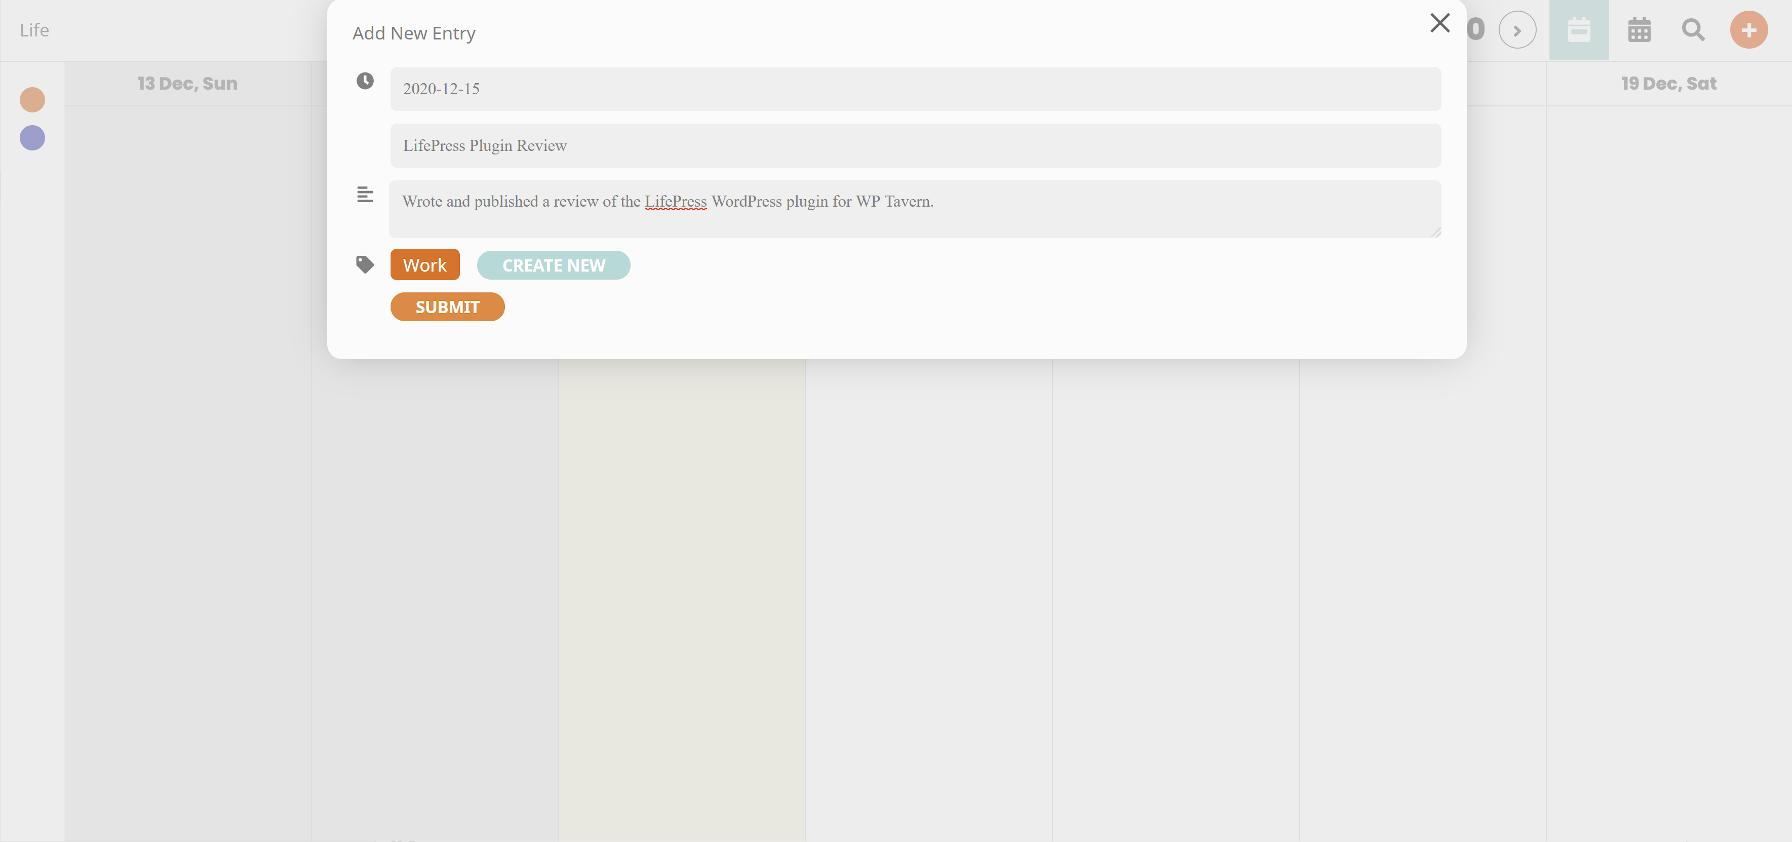 Adding a new calendar entry with the LifePress WordPress plugin.